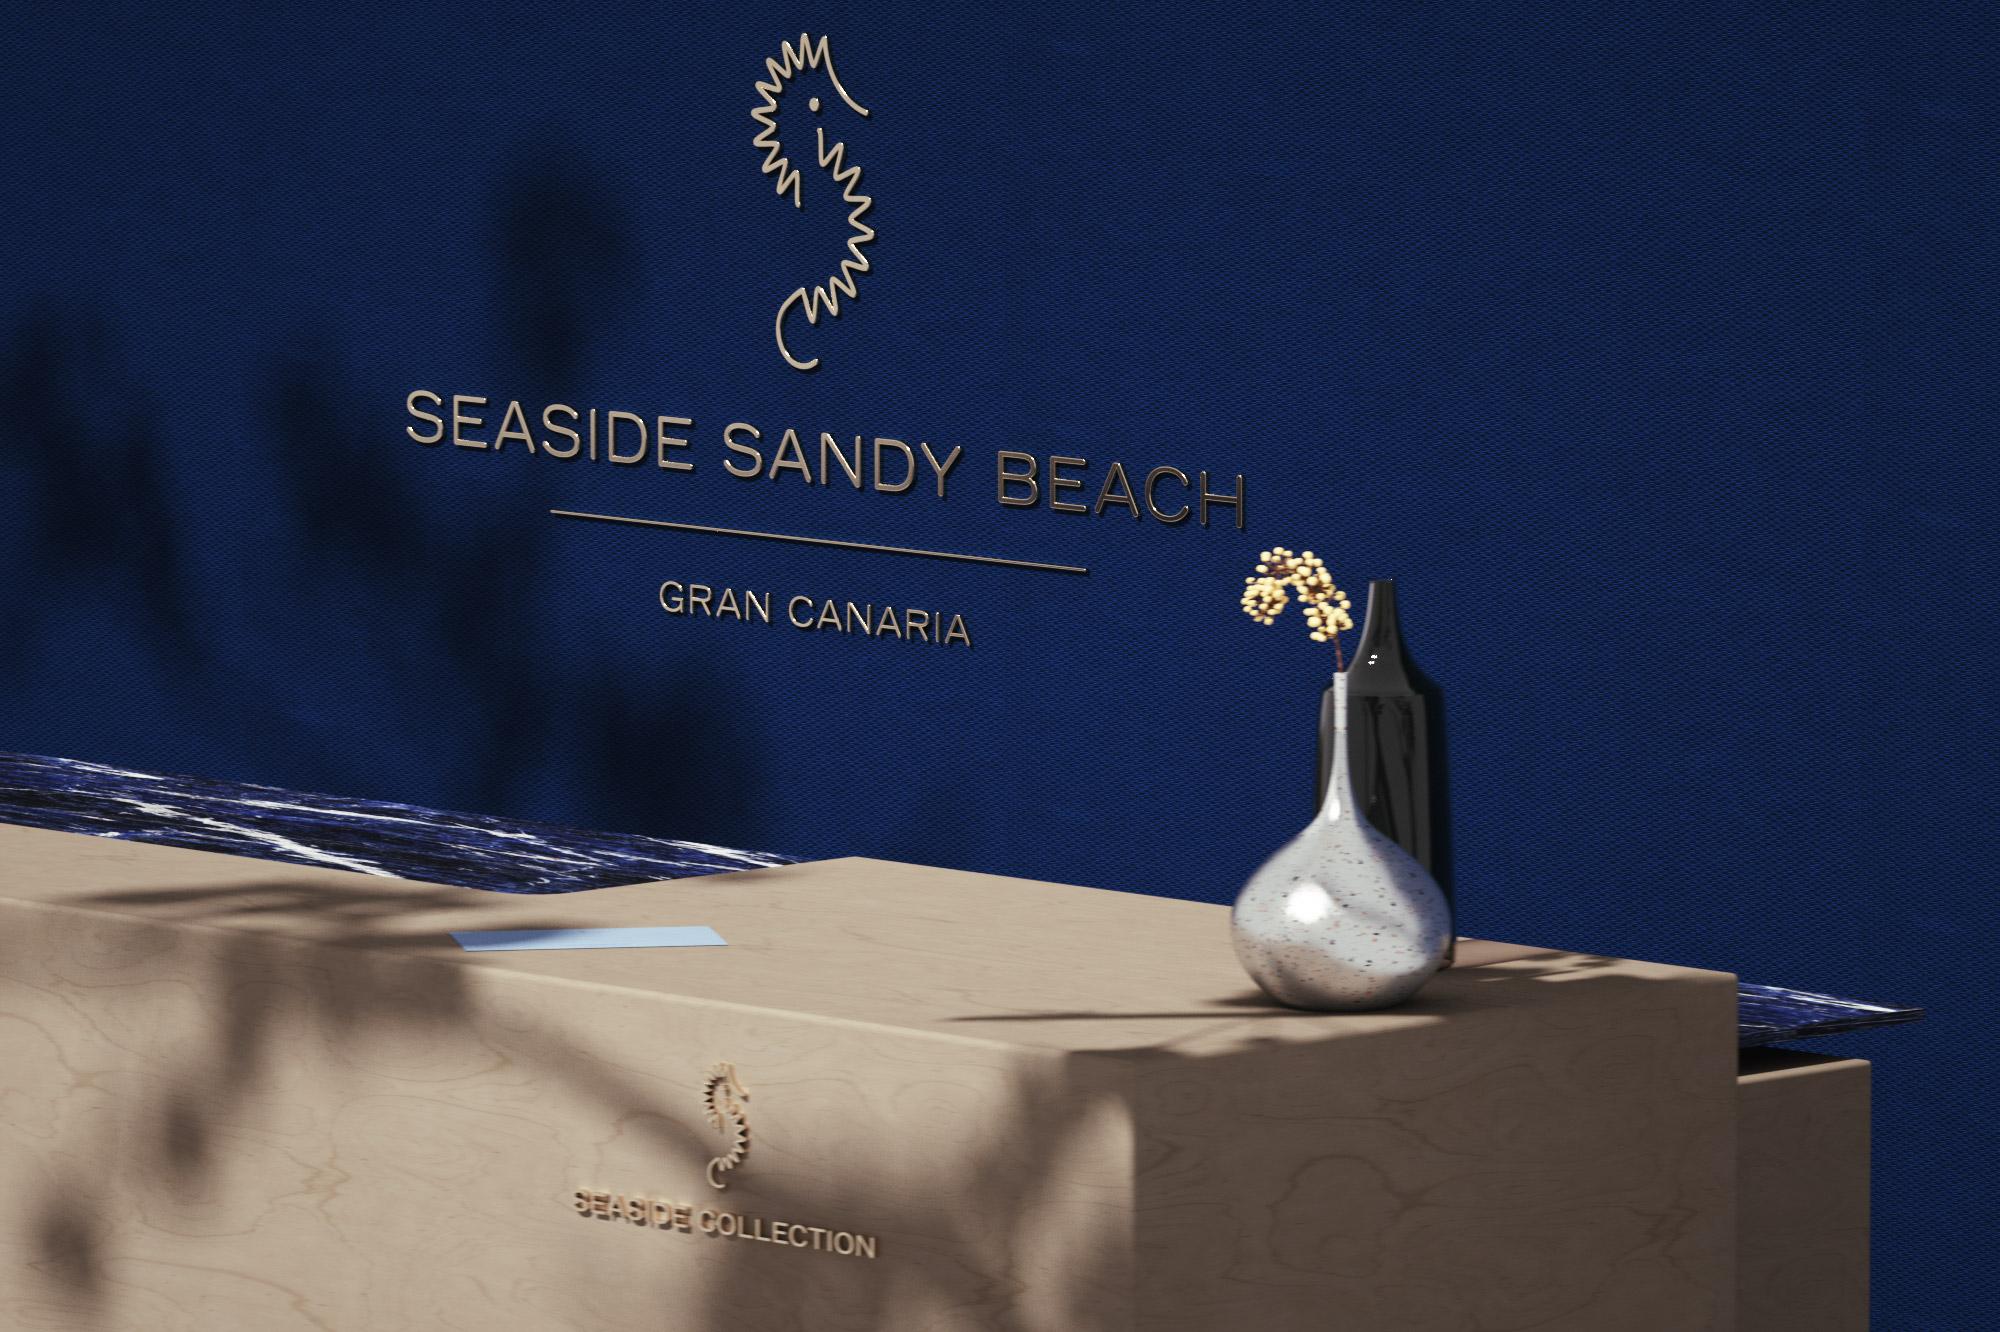 Seaside Sandy Beach Reception